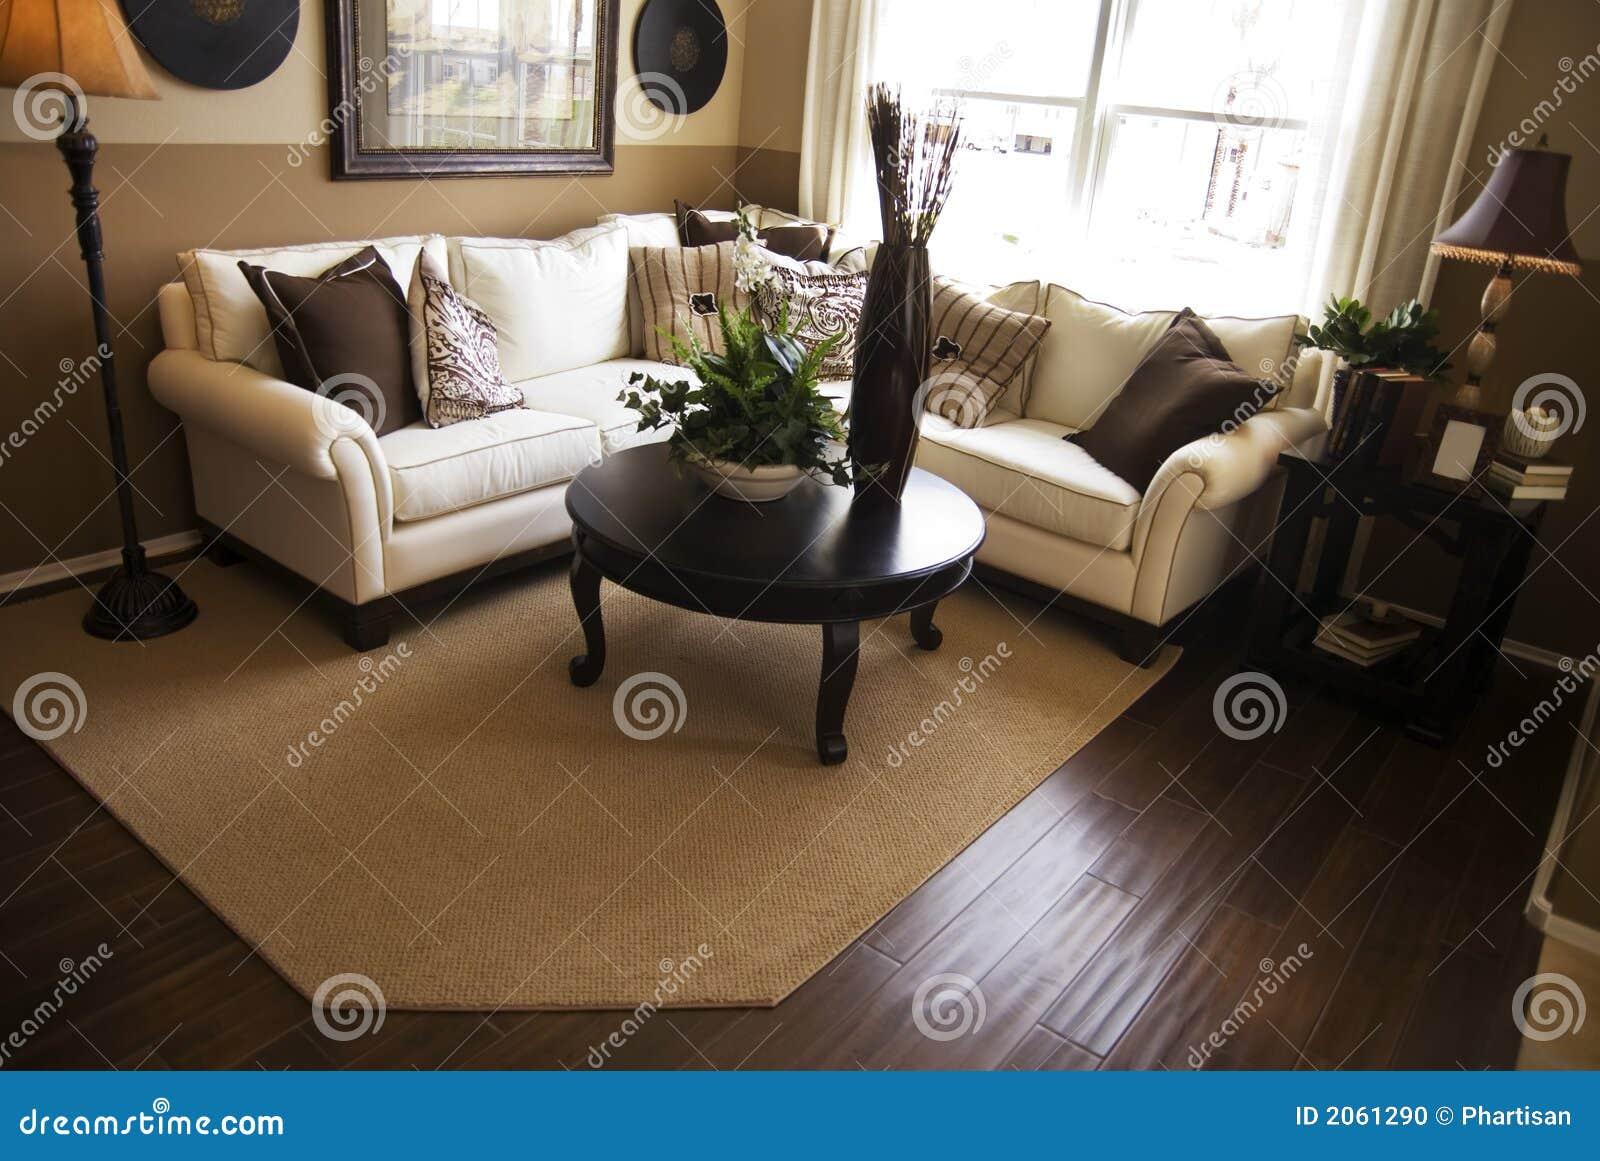 bodenbelag wohnzimmer naturstein:Living Rooms with Hardwood Floors